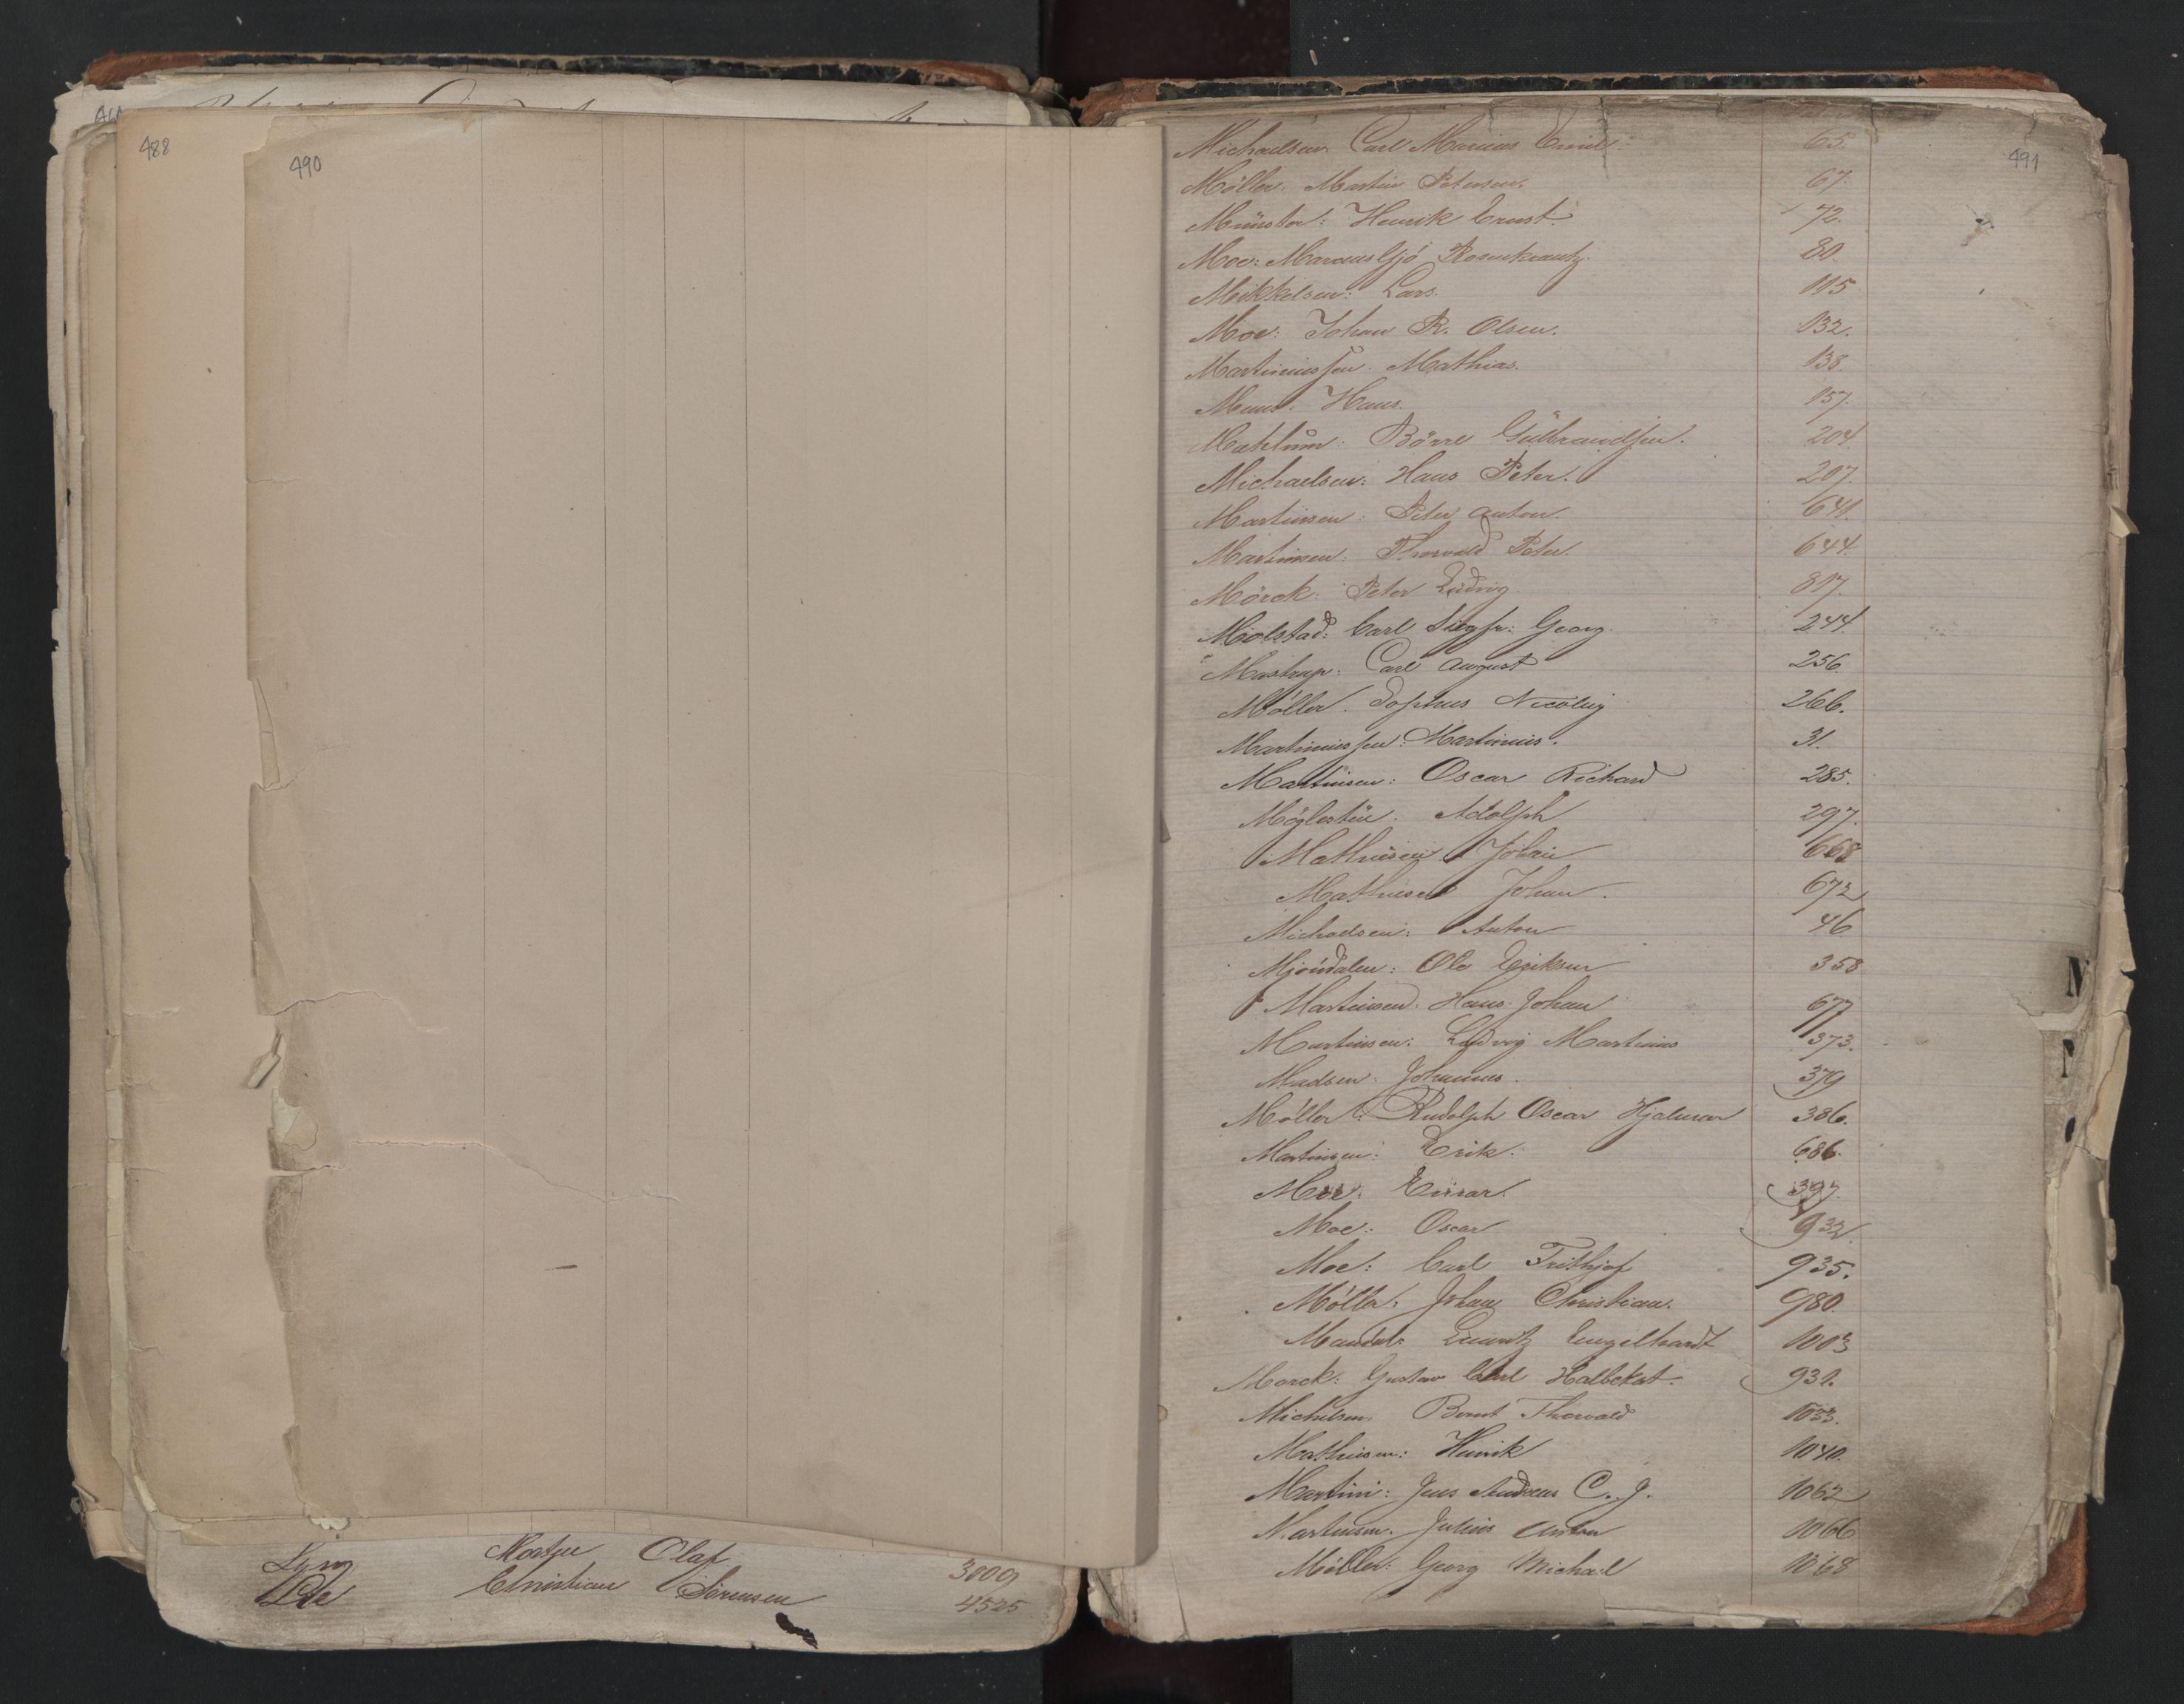 SAO, Oslo sjømannskontor, F/Fa/L0001: Register for Kristiania krets, 1866-1891, s. 490-491